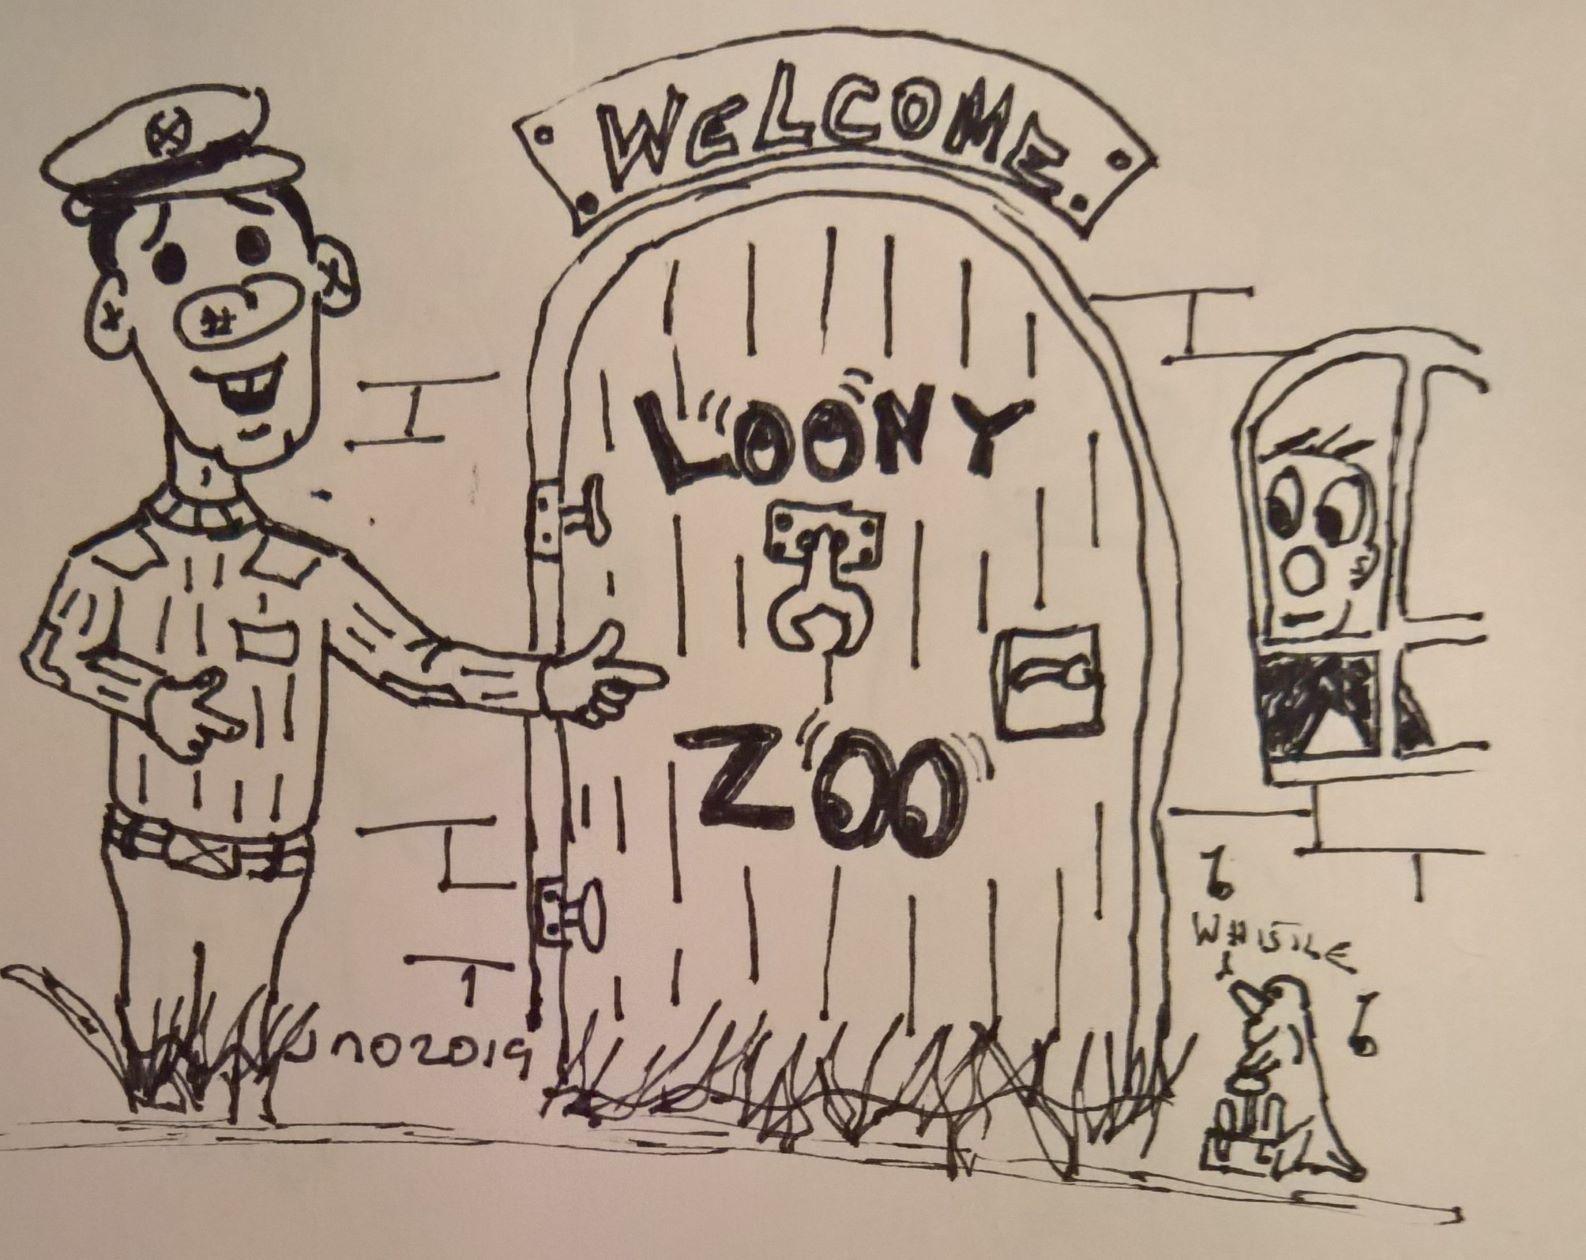 landyzoo welcome 1.jpg